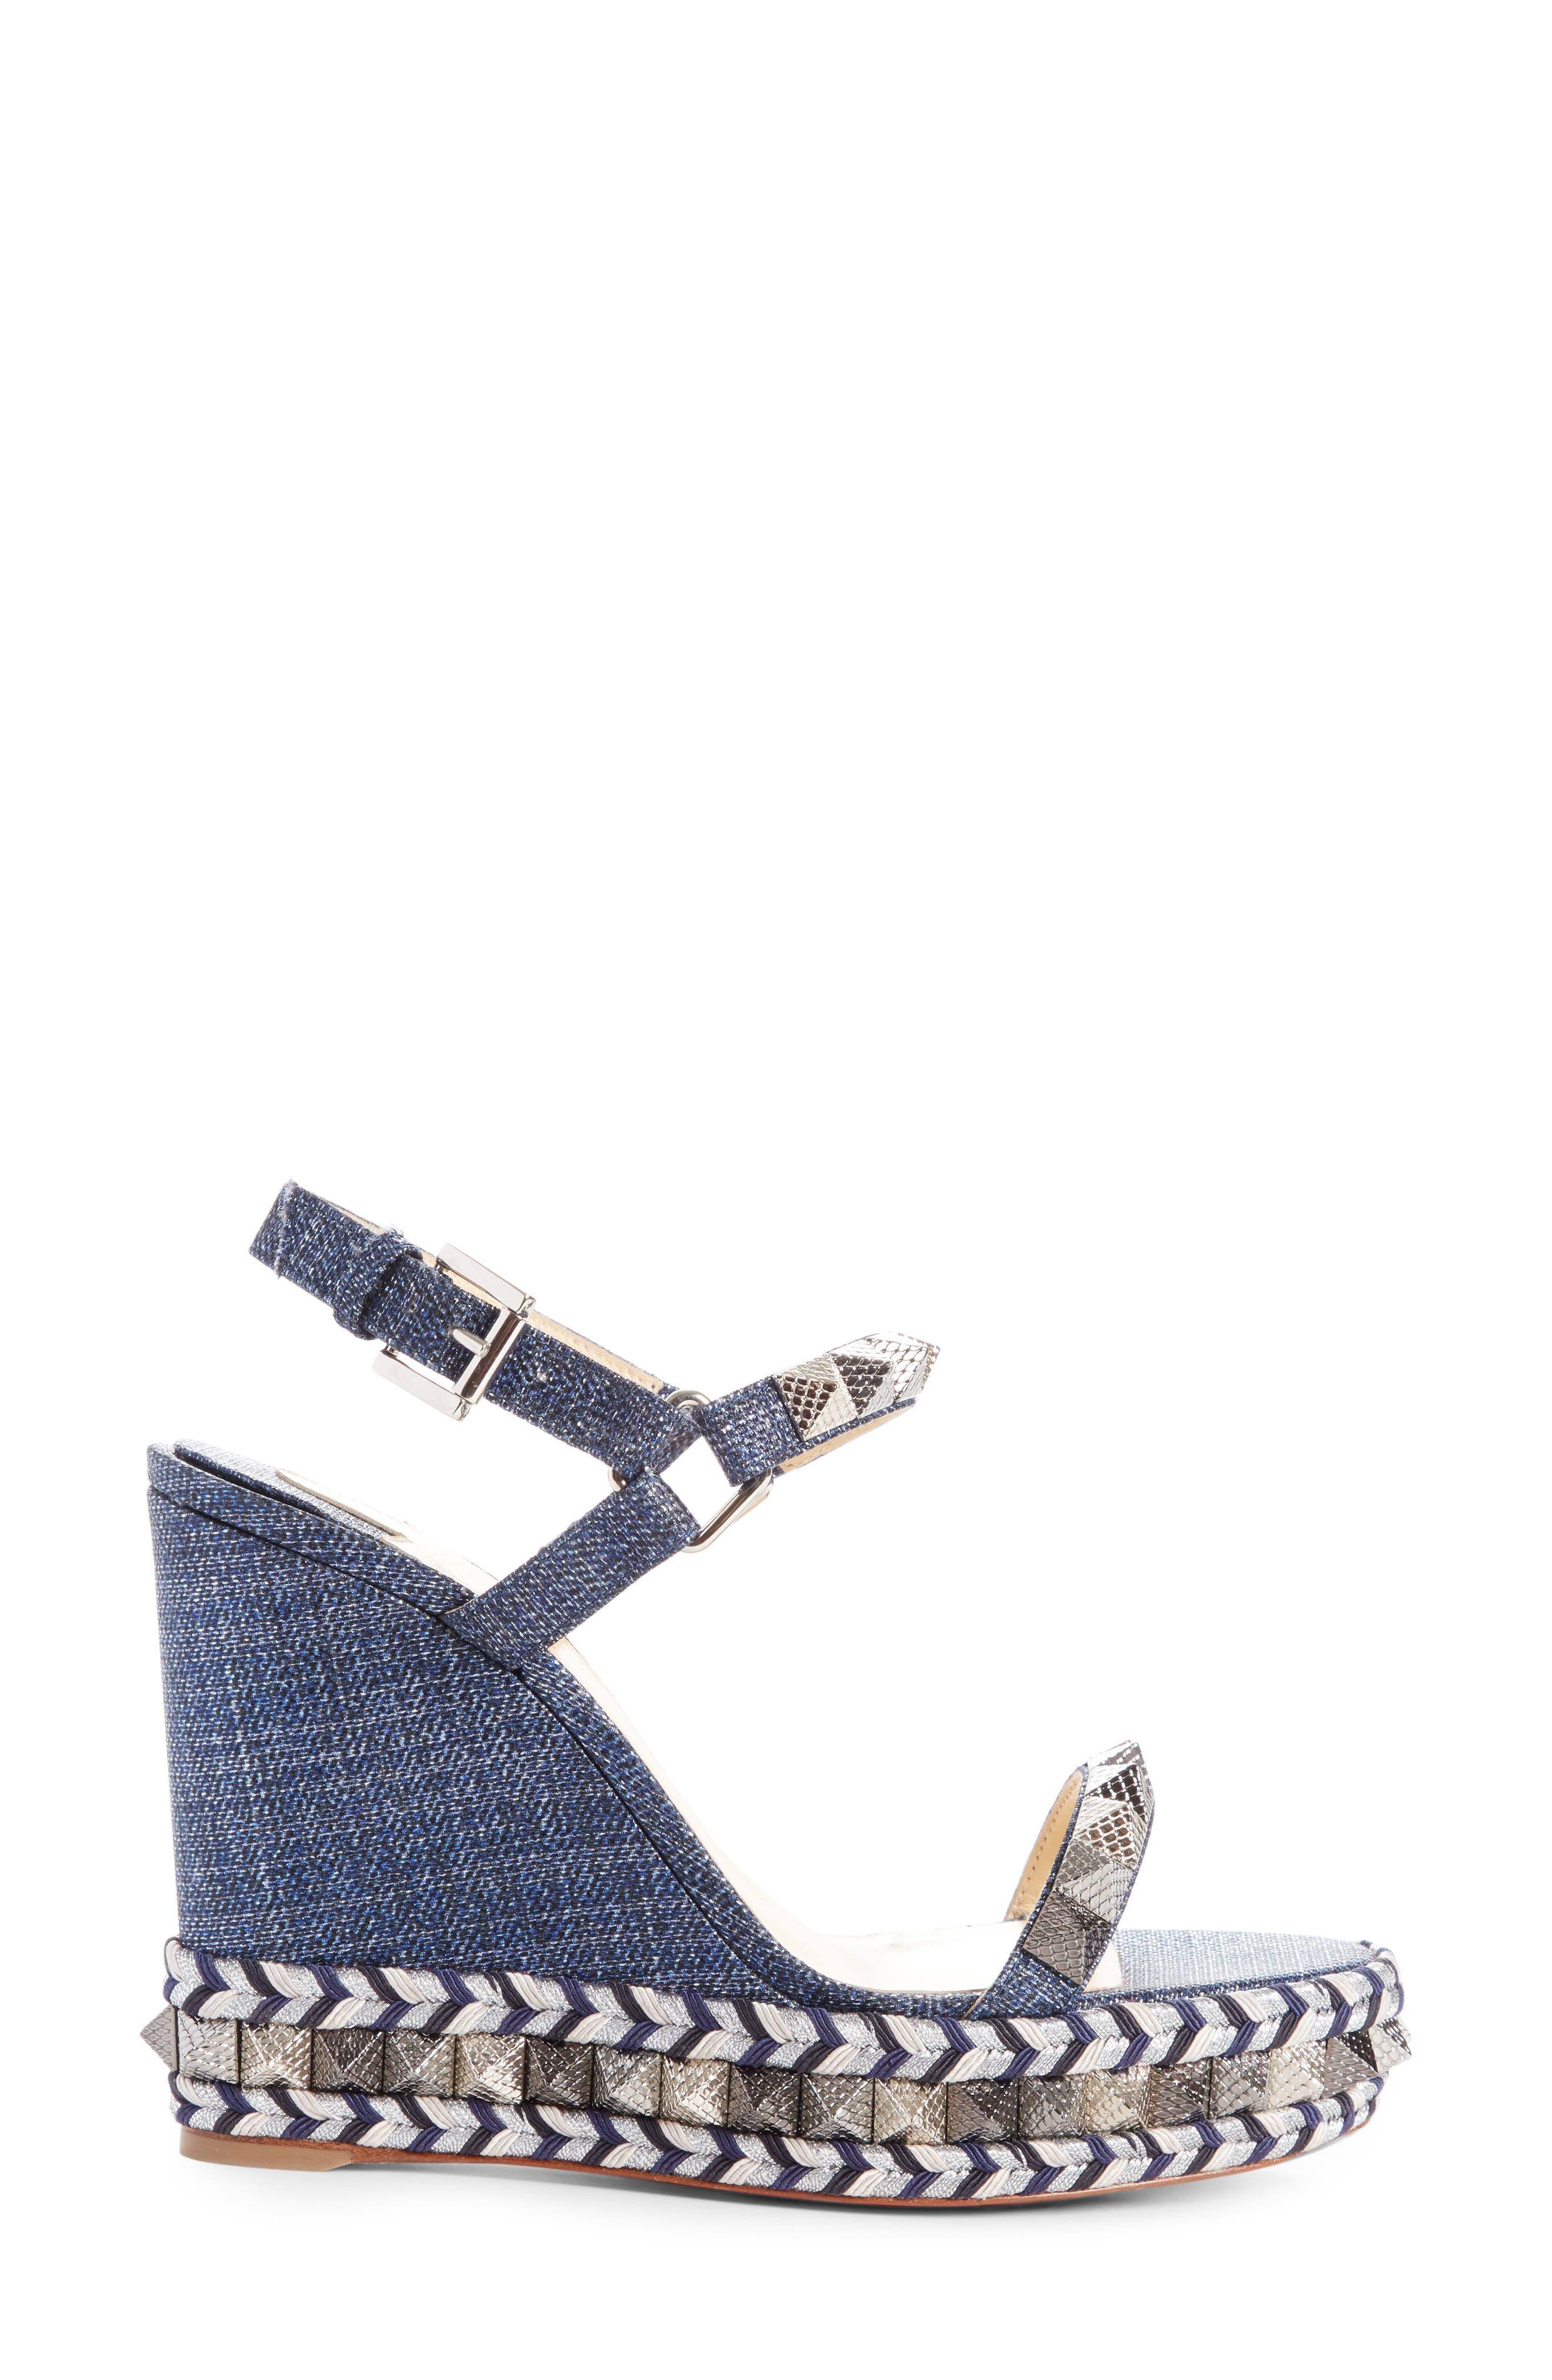 Pyraclou Studded Platform Wedge Sandal,                             Alternate thumbnail 3, color,                             DENIM